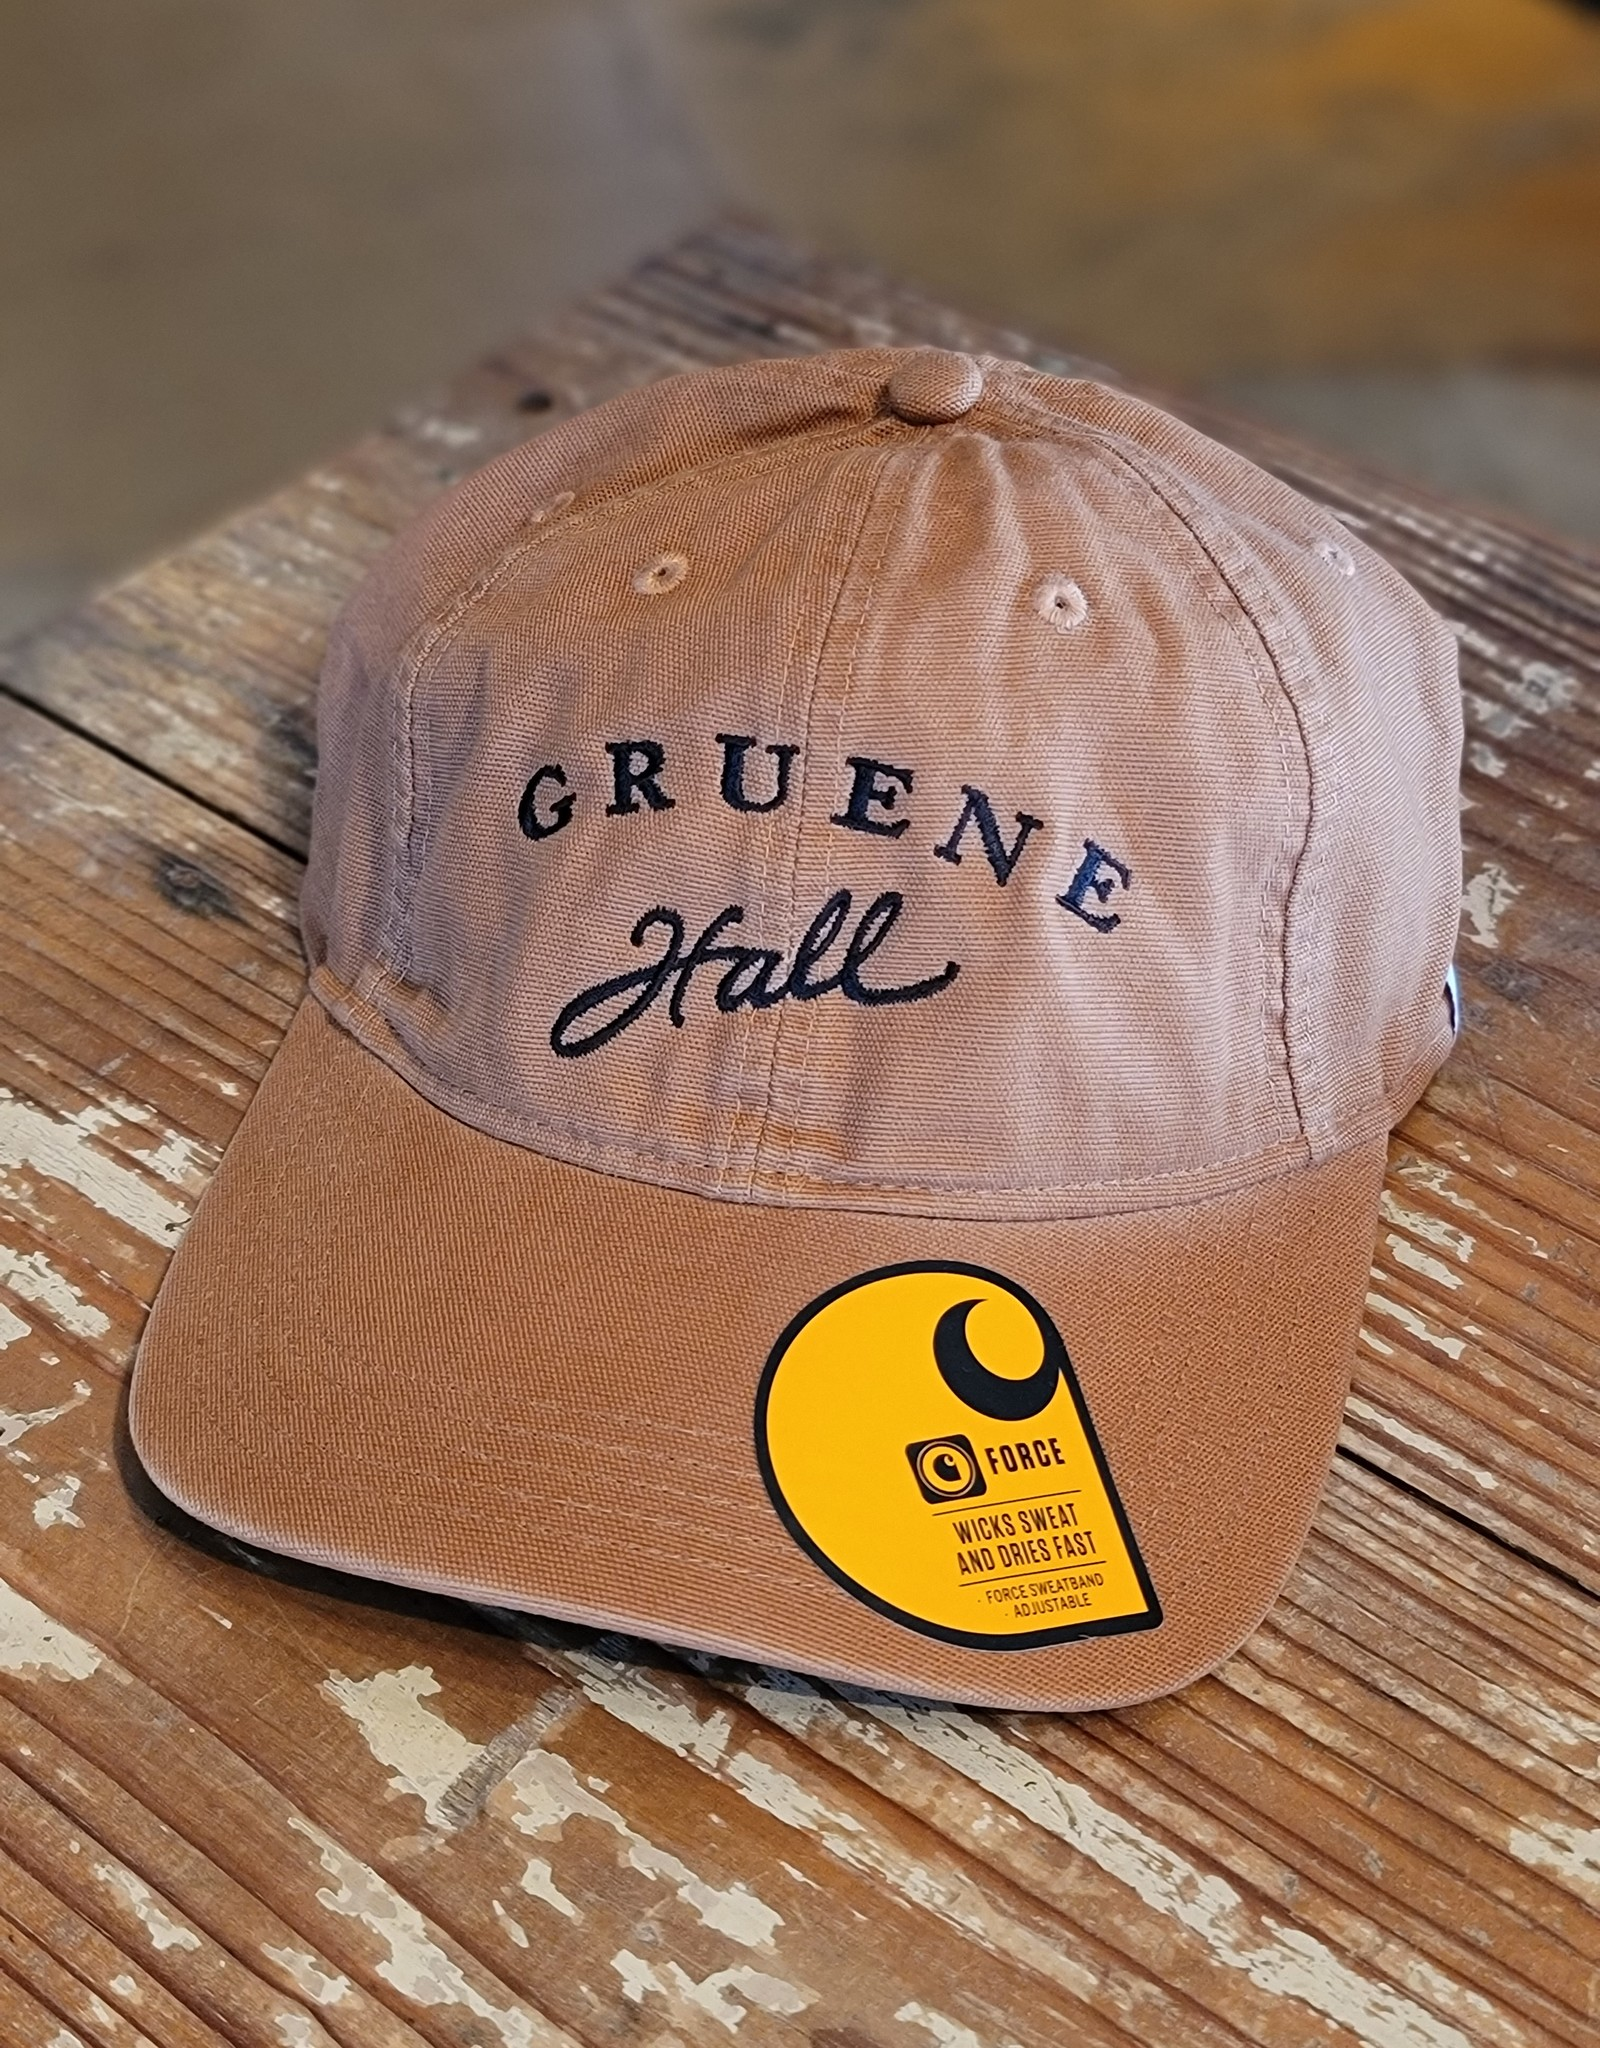 Gruene Hall Cap by Carhartt